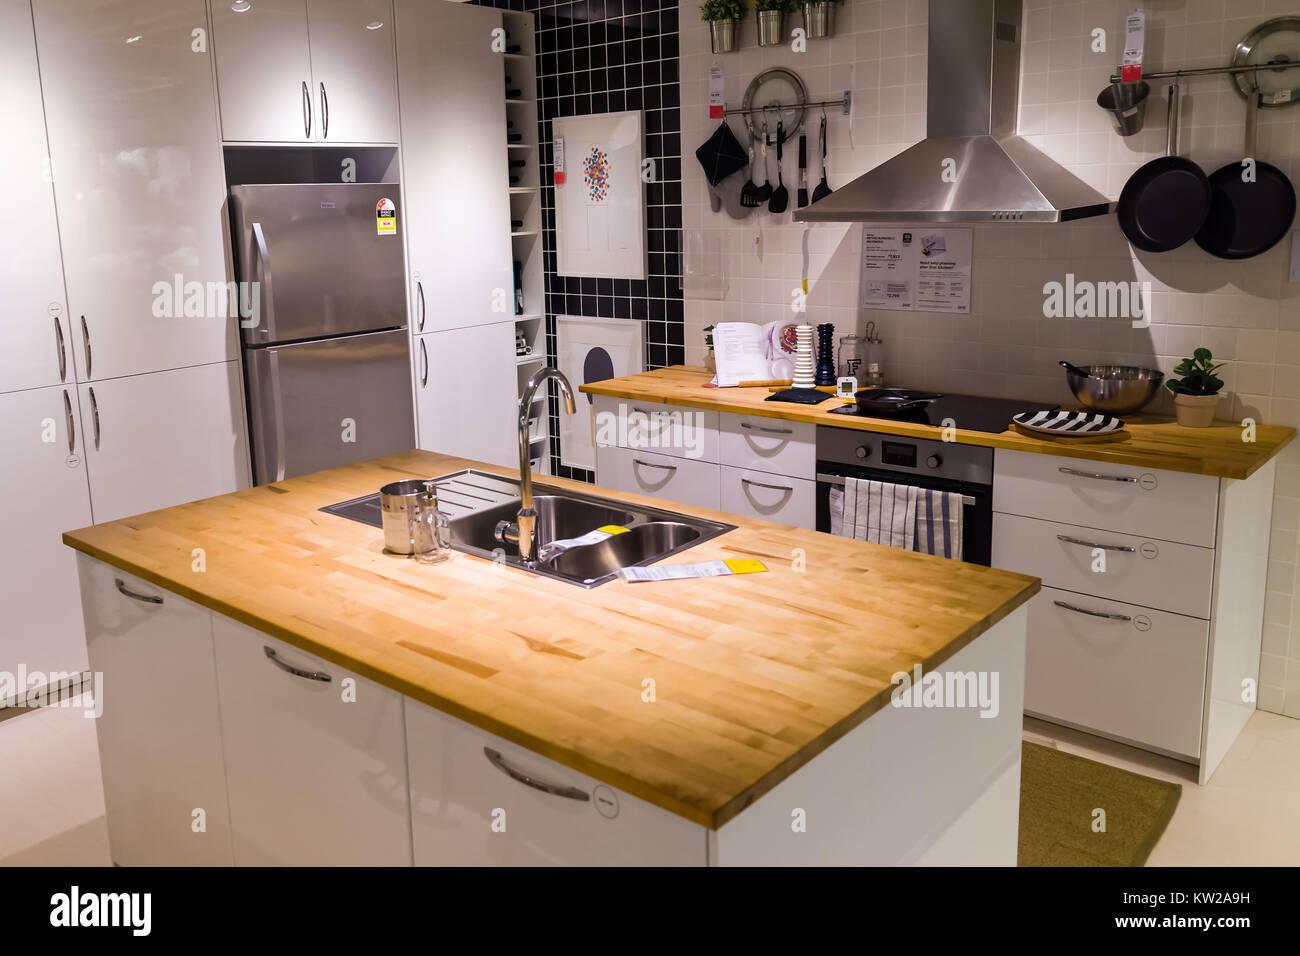 Modell Küche Bei Ikea Showroom In Tempe, Sydney, Austral